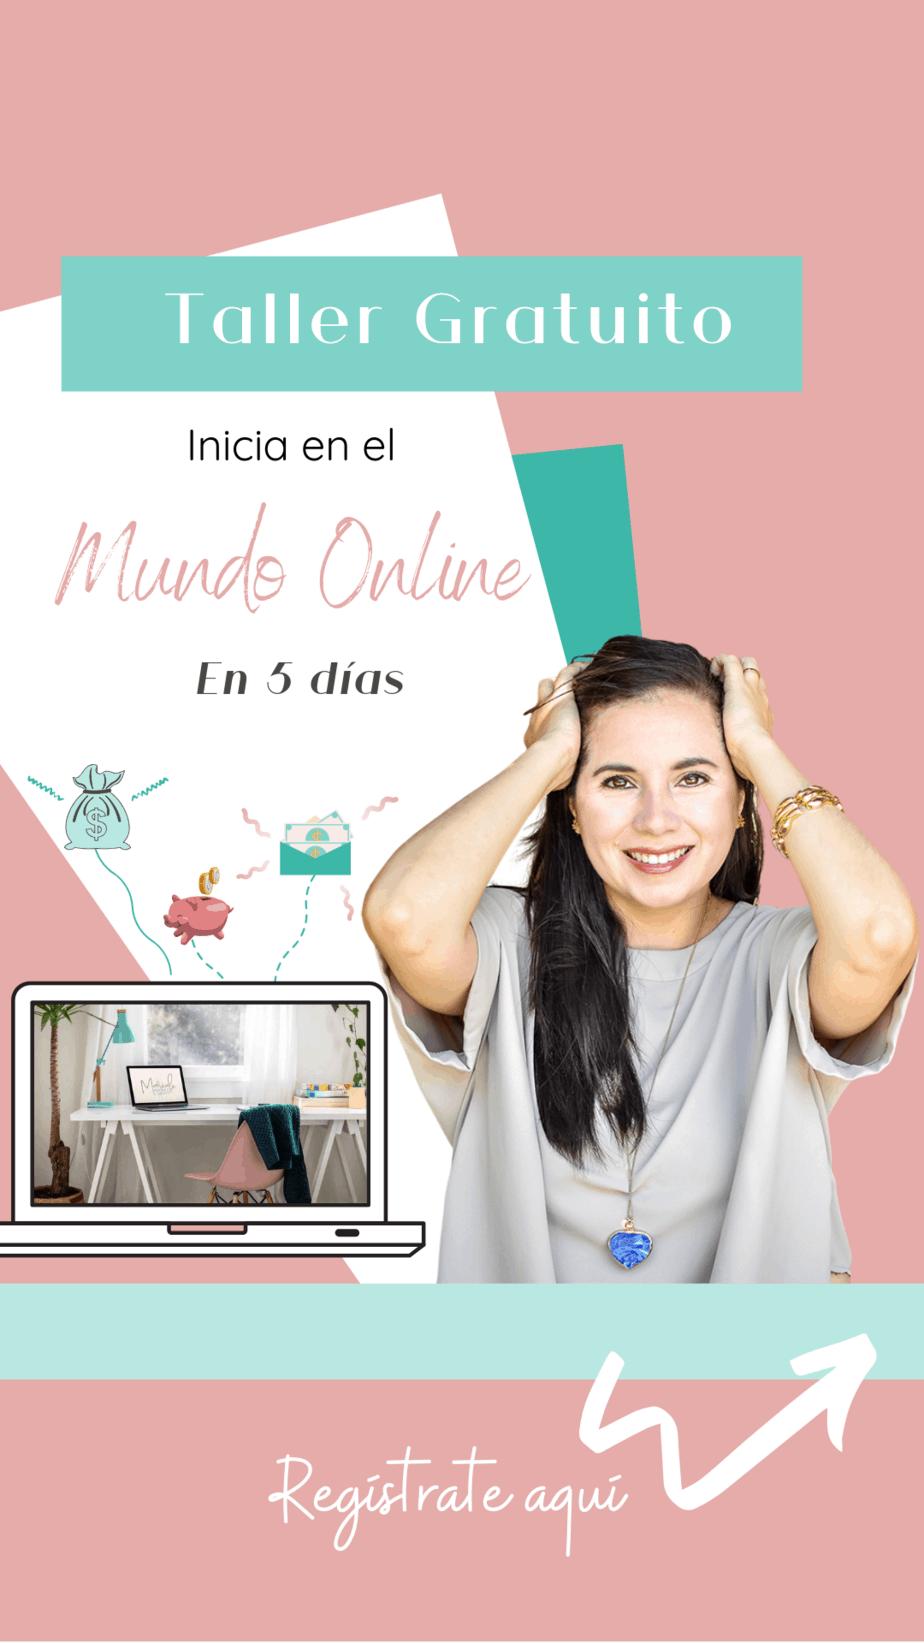 Taller gratuito negocios online